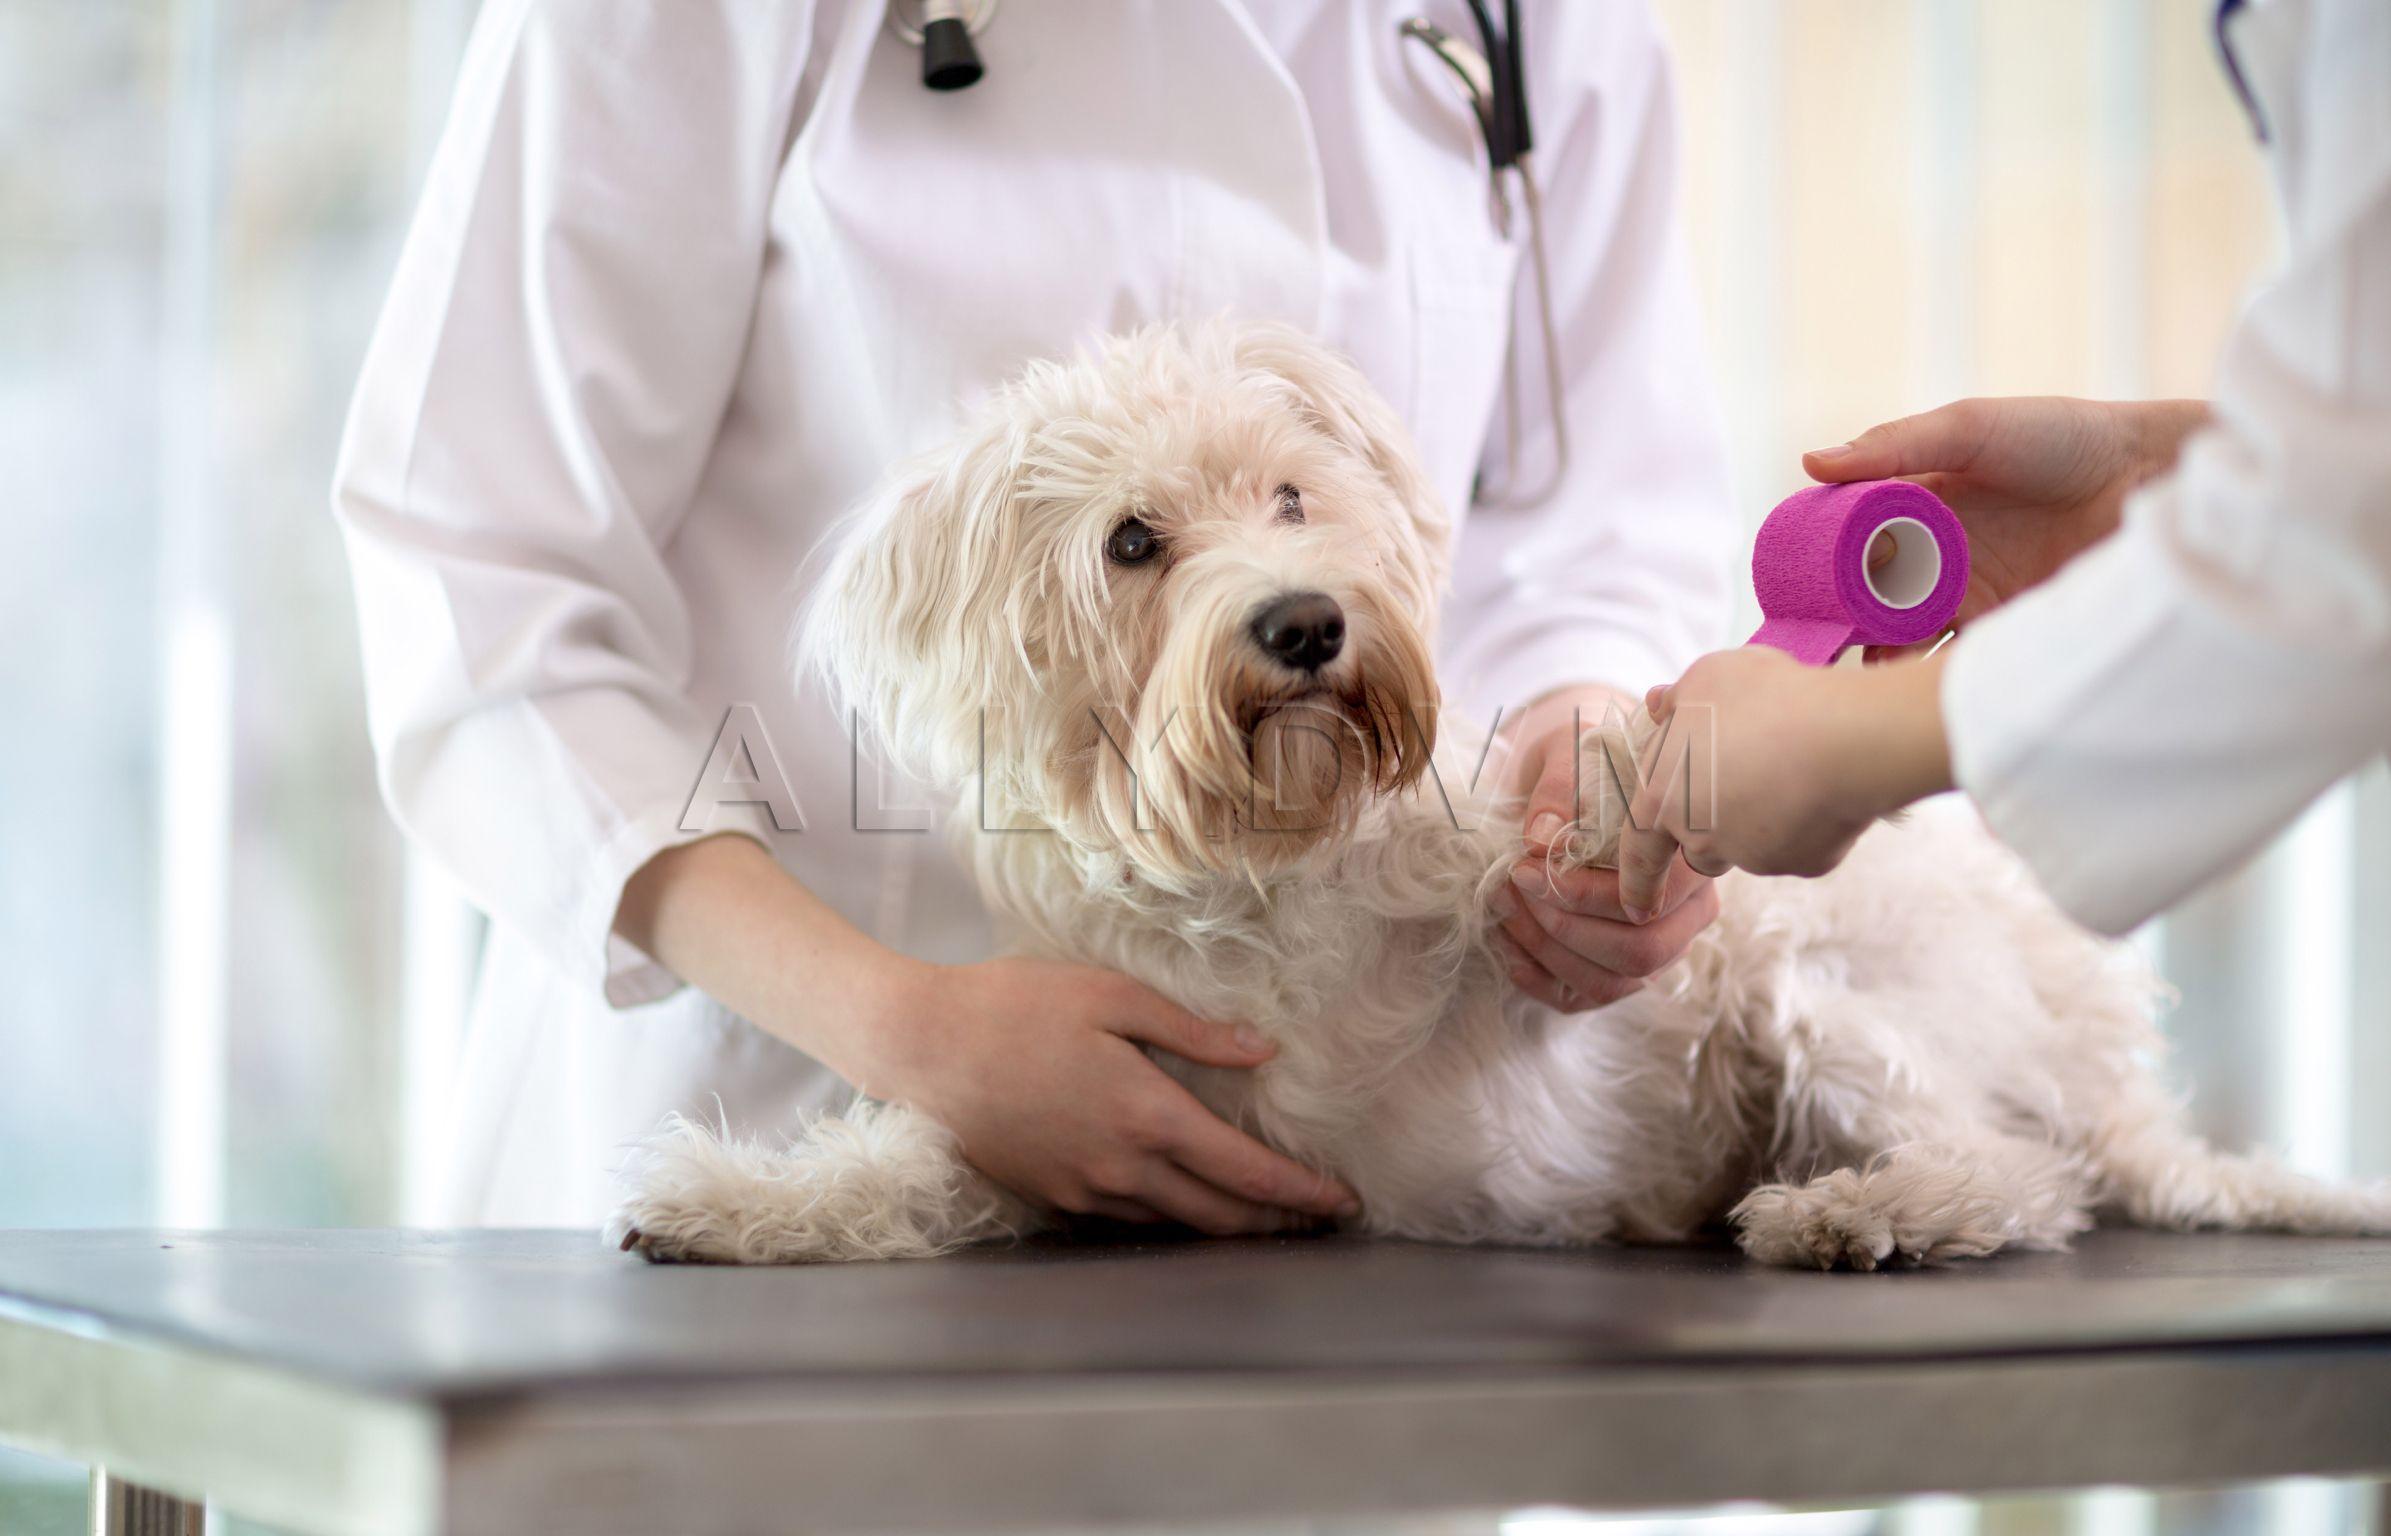 Pin By Allydvm On Veterinary Puppy Insurance Emergency Vet Dog